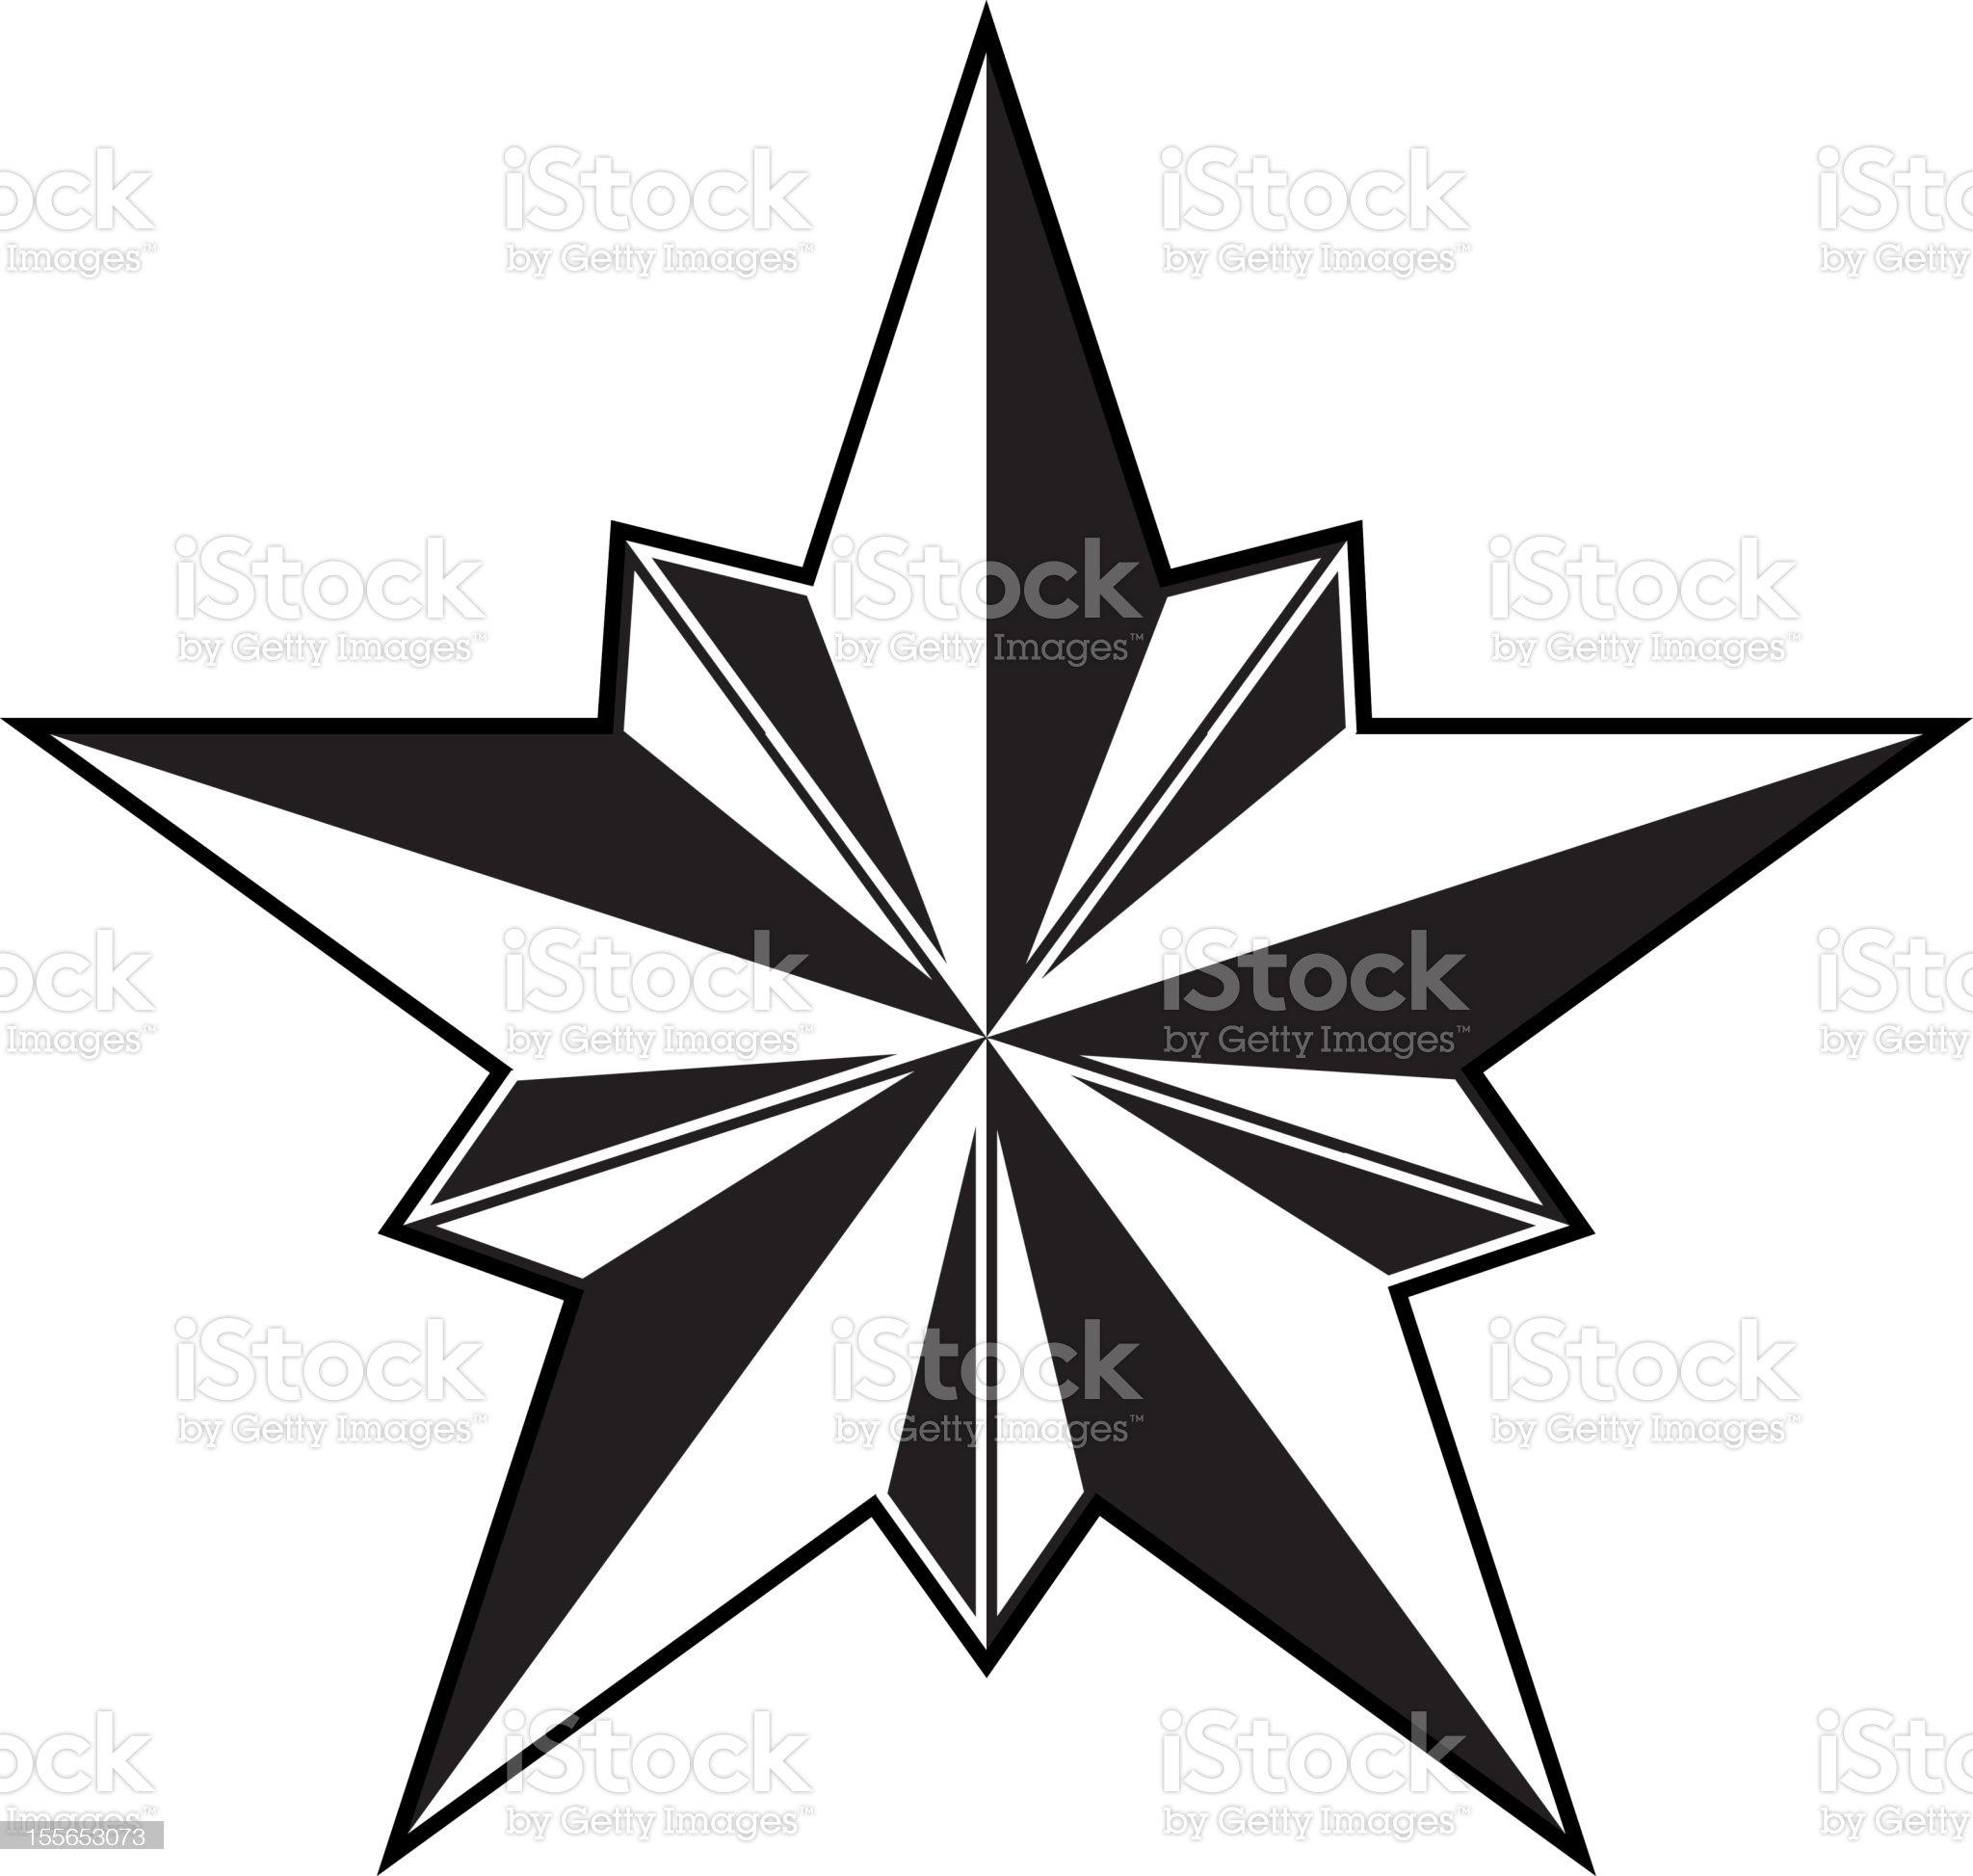 Beveled Vectorized Star royalty-free stock vector art